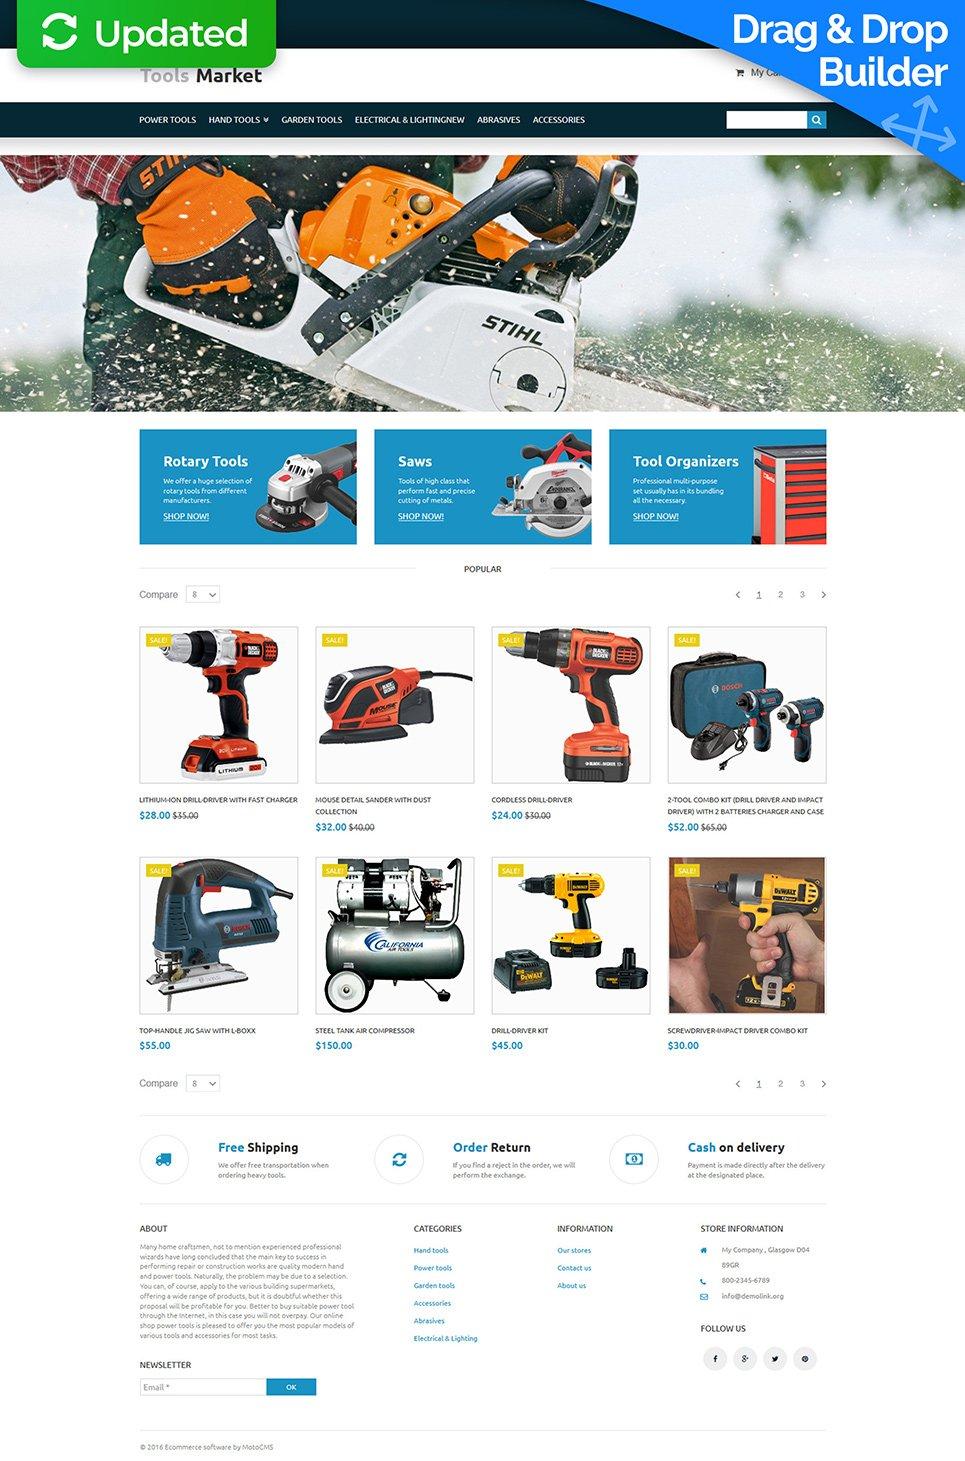 Tools Market Ecommerce Website Template - image